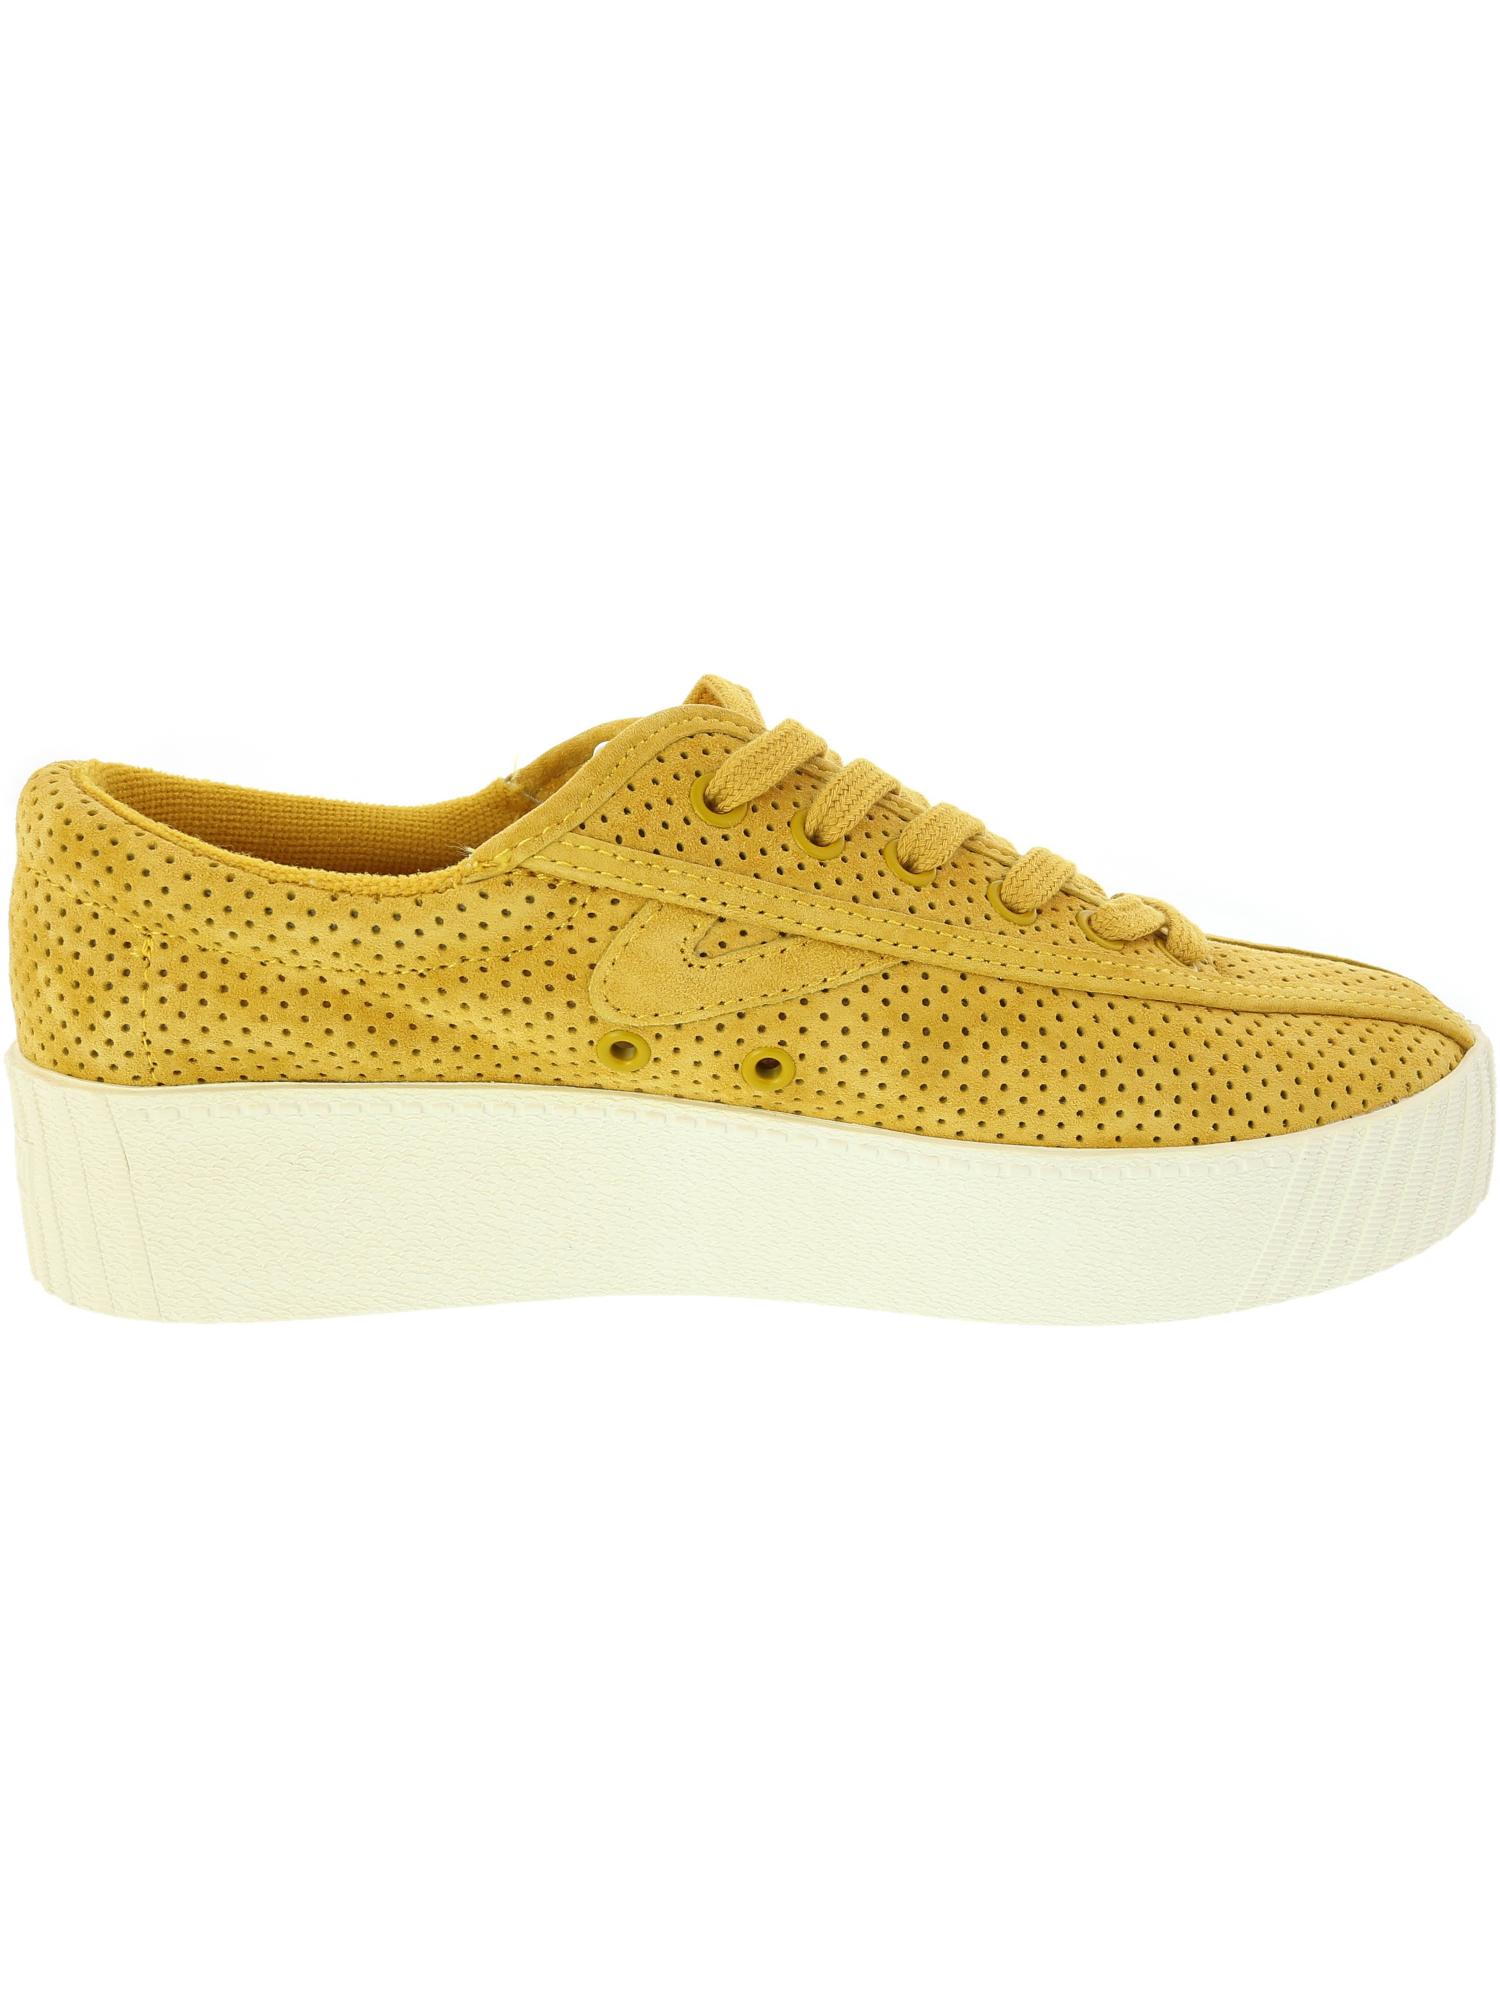 Tretorn-Nylite-3-Bold-Suede-Fashion-Sneaker thumbnail 22